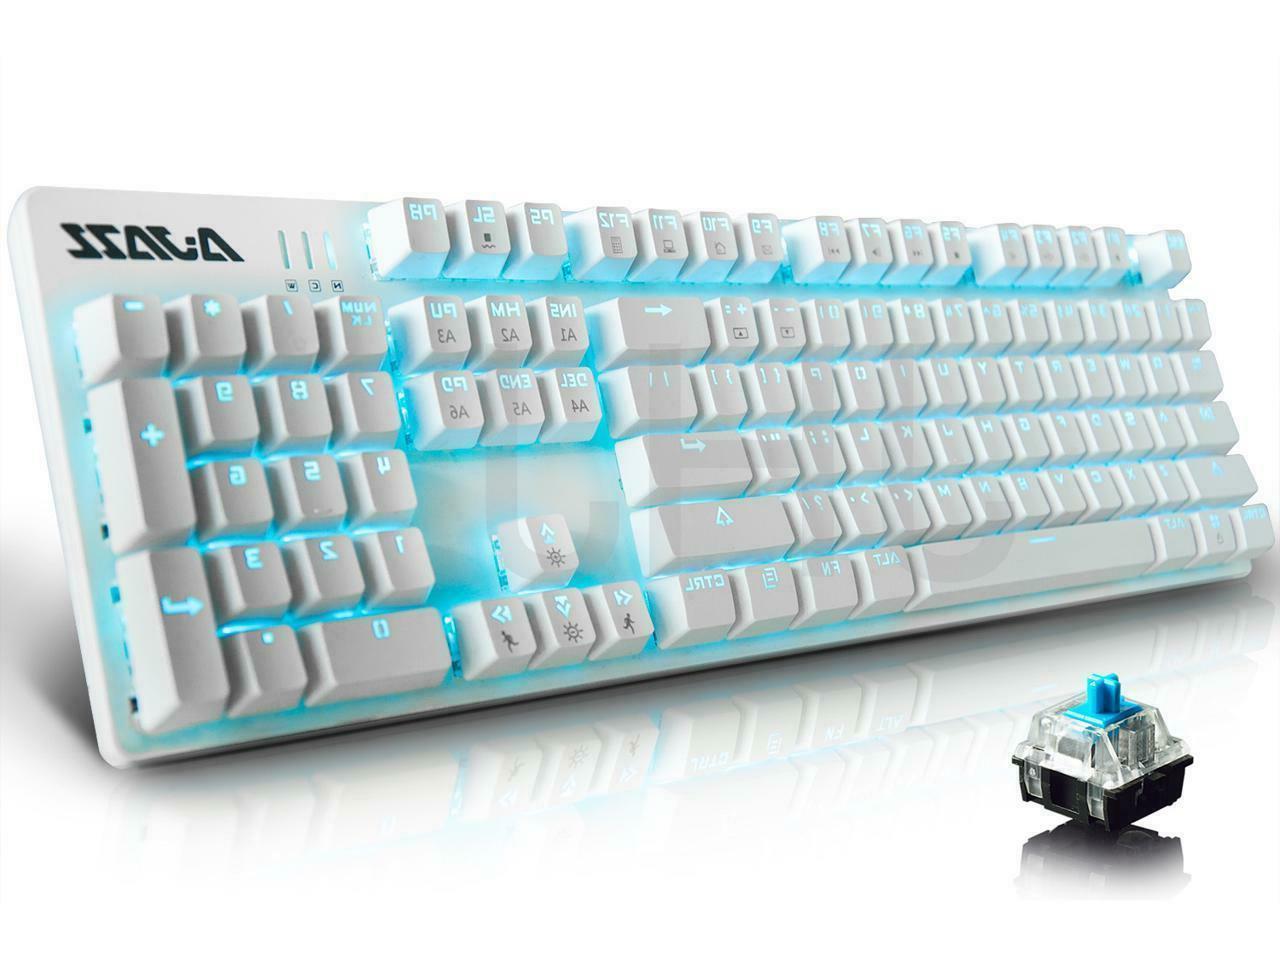 Ajazz AK52 Mechanical Gaming with Keys/Backlit USB Wired